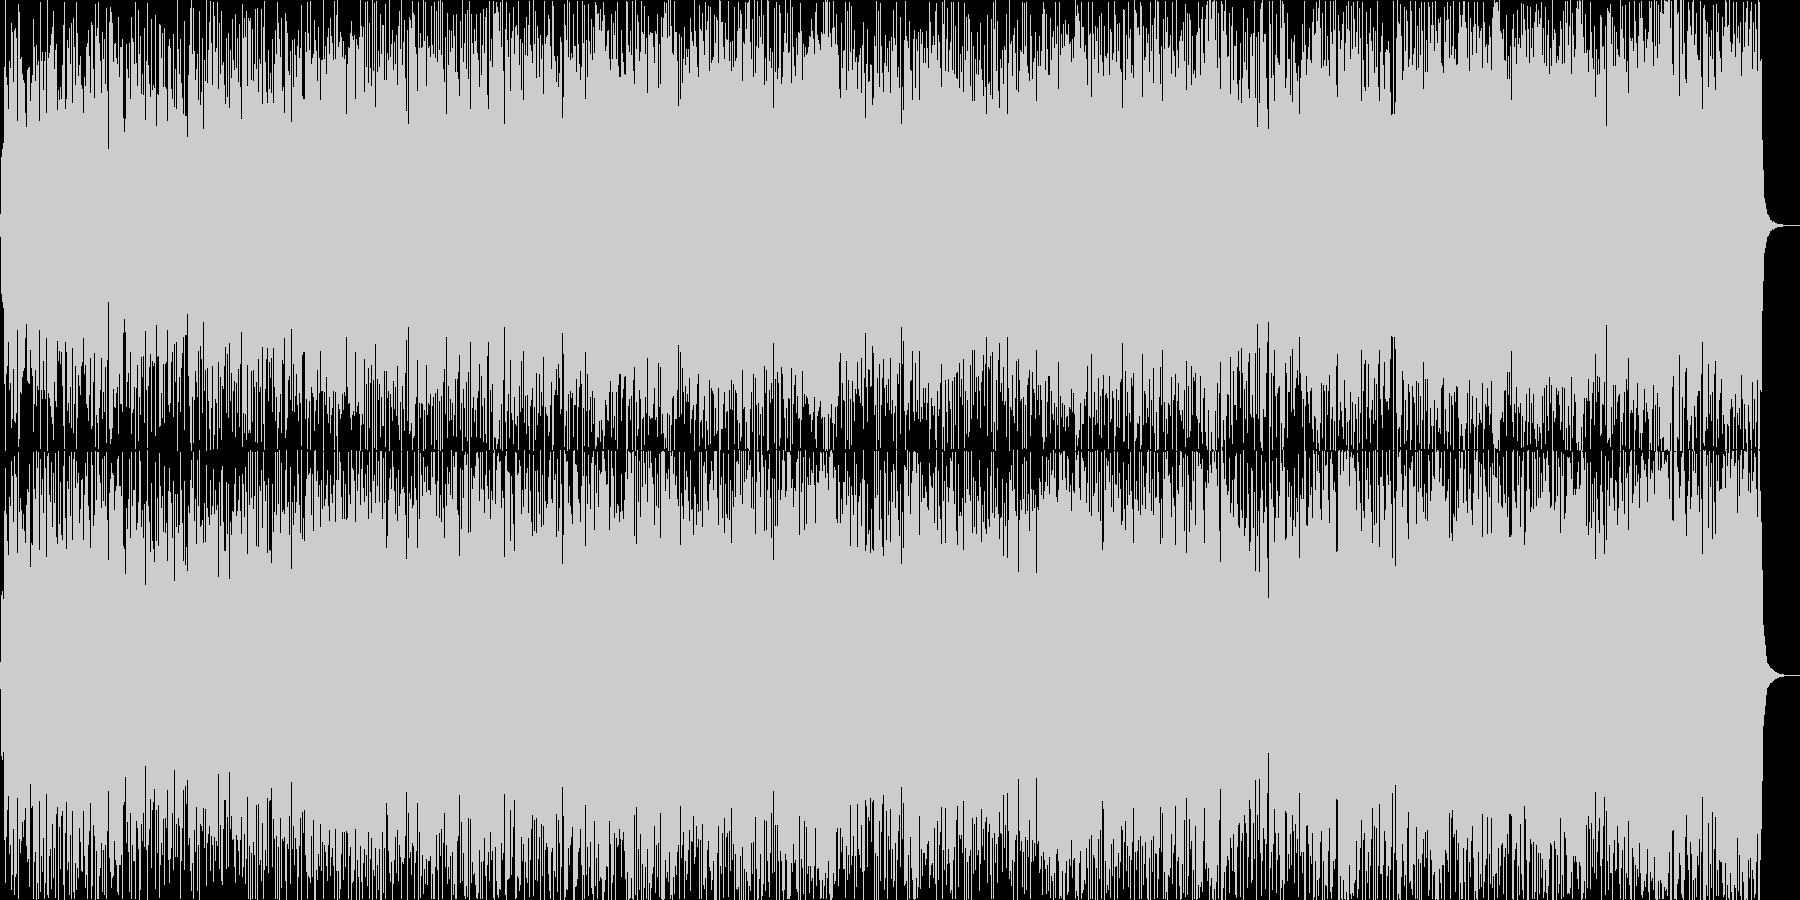 Light BGM with lively flute's unreproduced waveform